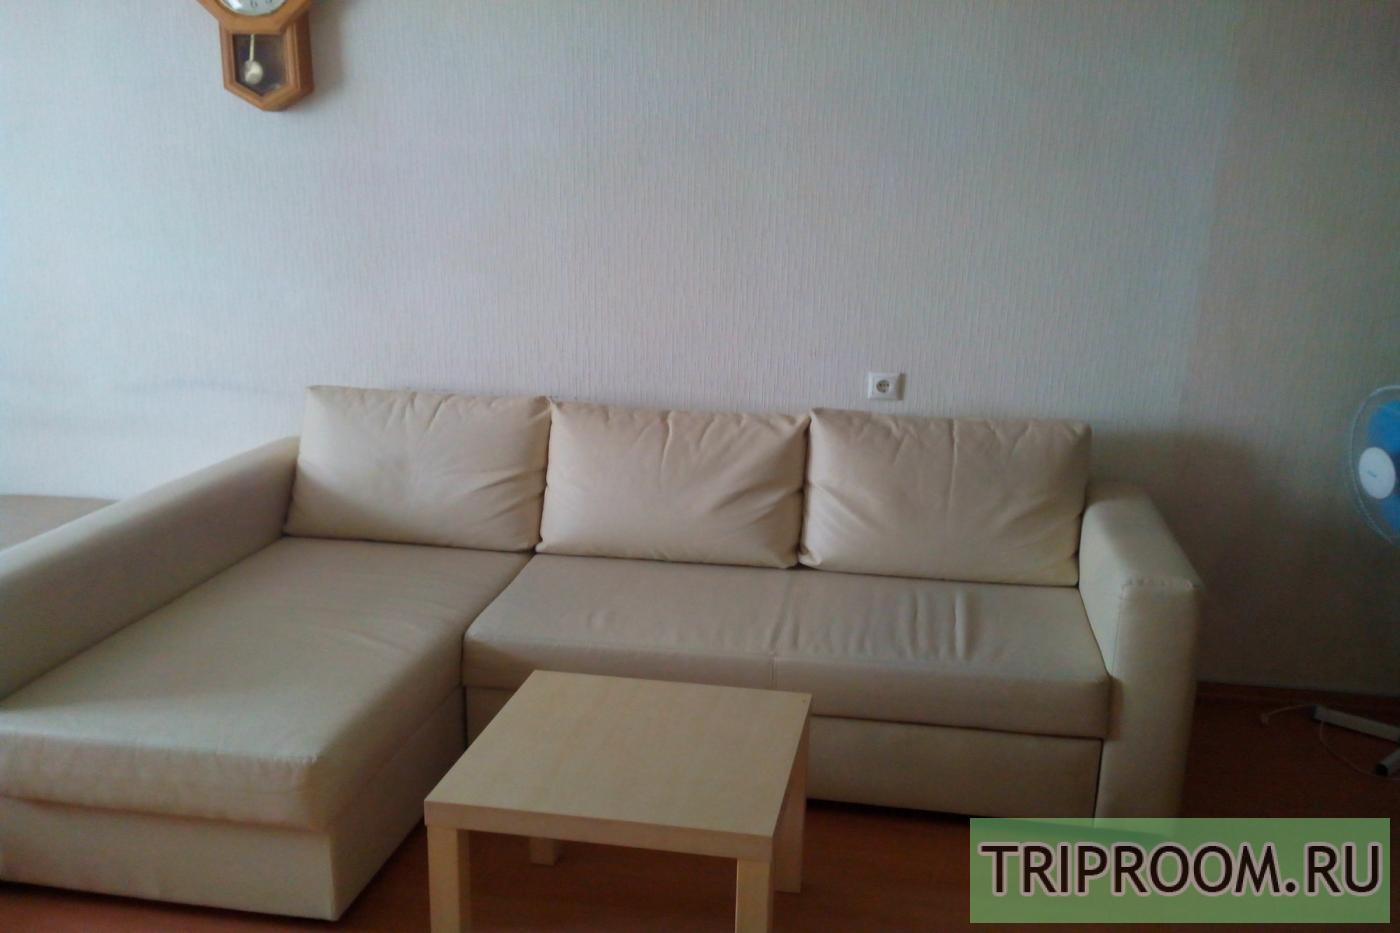 2-комнатная квартира посуточно (вариант № 10044), ул. Ломоносова улица, фото № 19